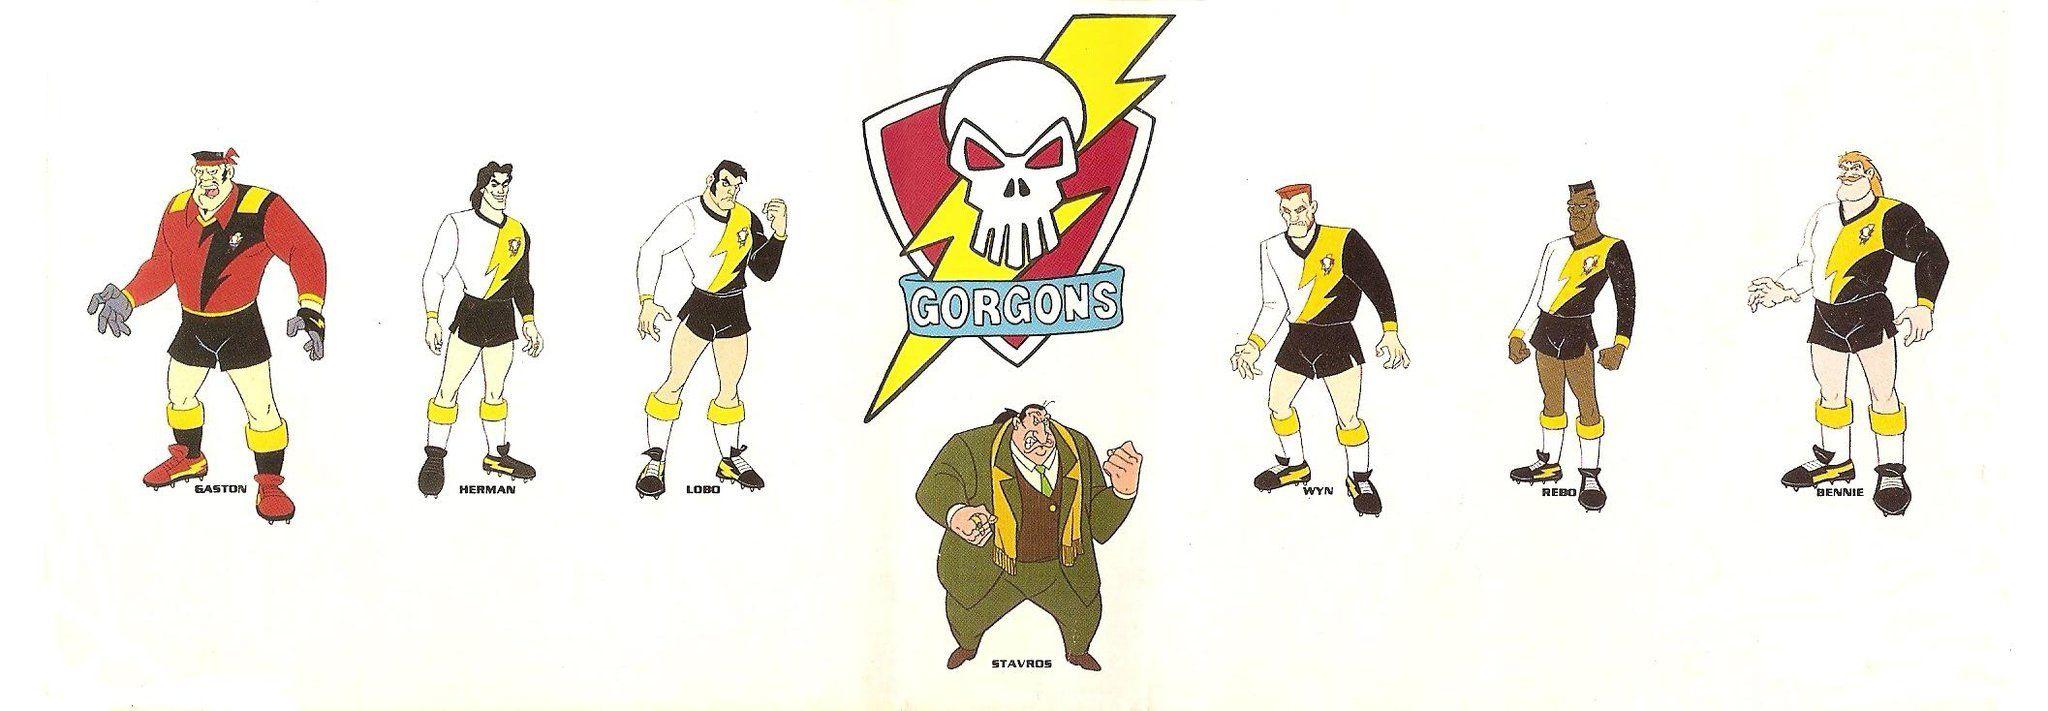 Twink football team cartoon